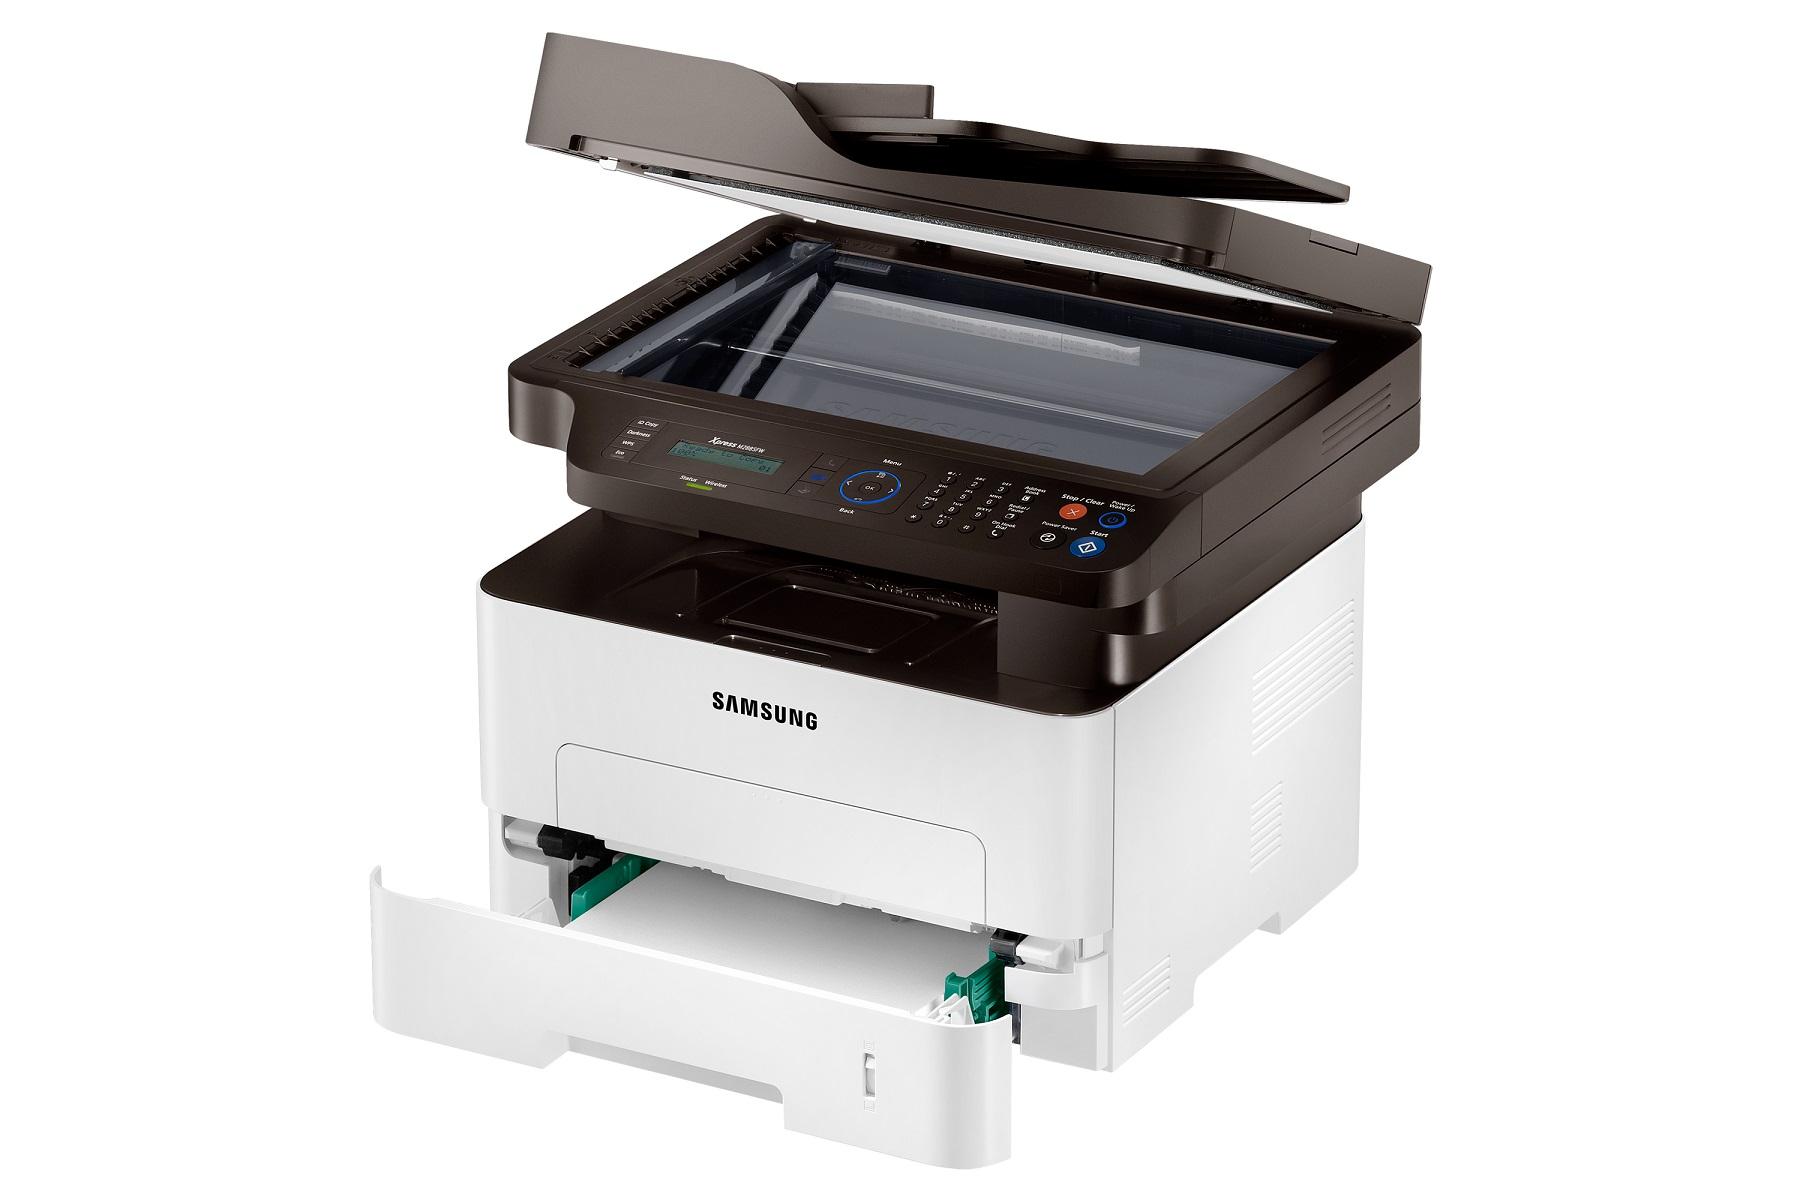 HP - Samsung SL-M2885FW,A4,28ppm,4800x600dpi,128Mb,PCL,USB,NFC,ethernet,wifi,ADF,fax